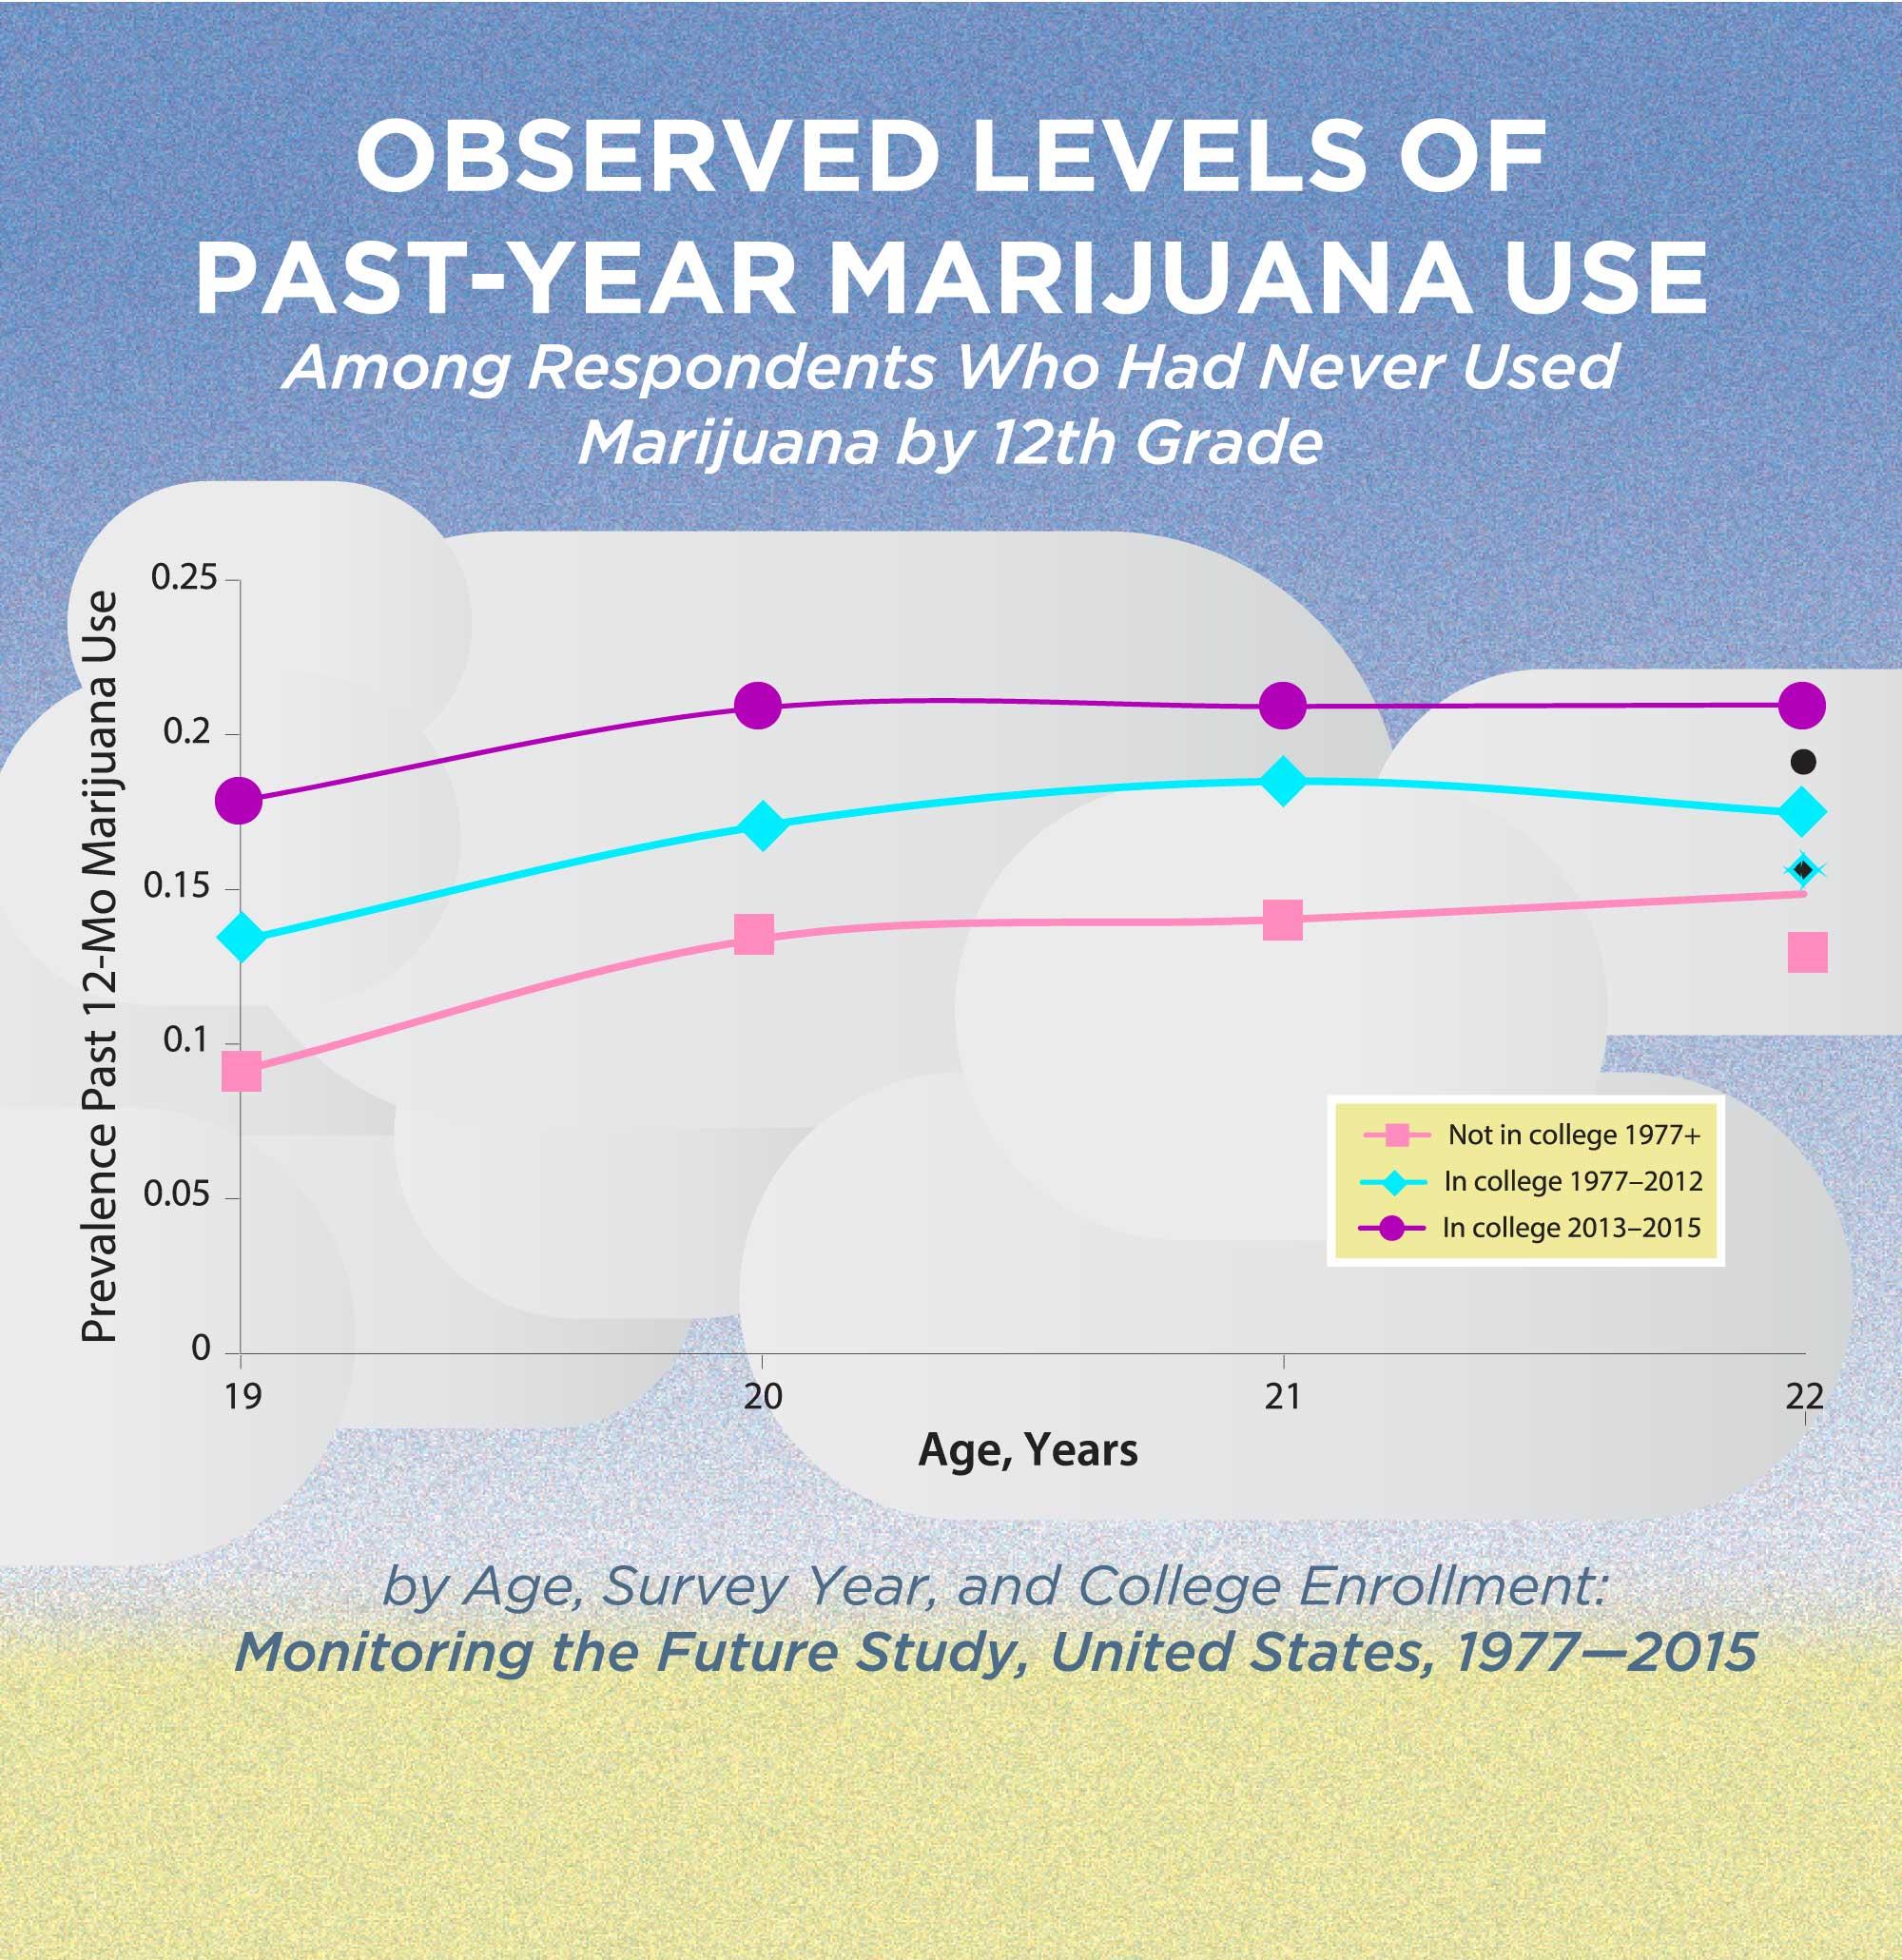 Observed levels of past-year marijuana use chart.